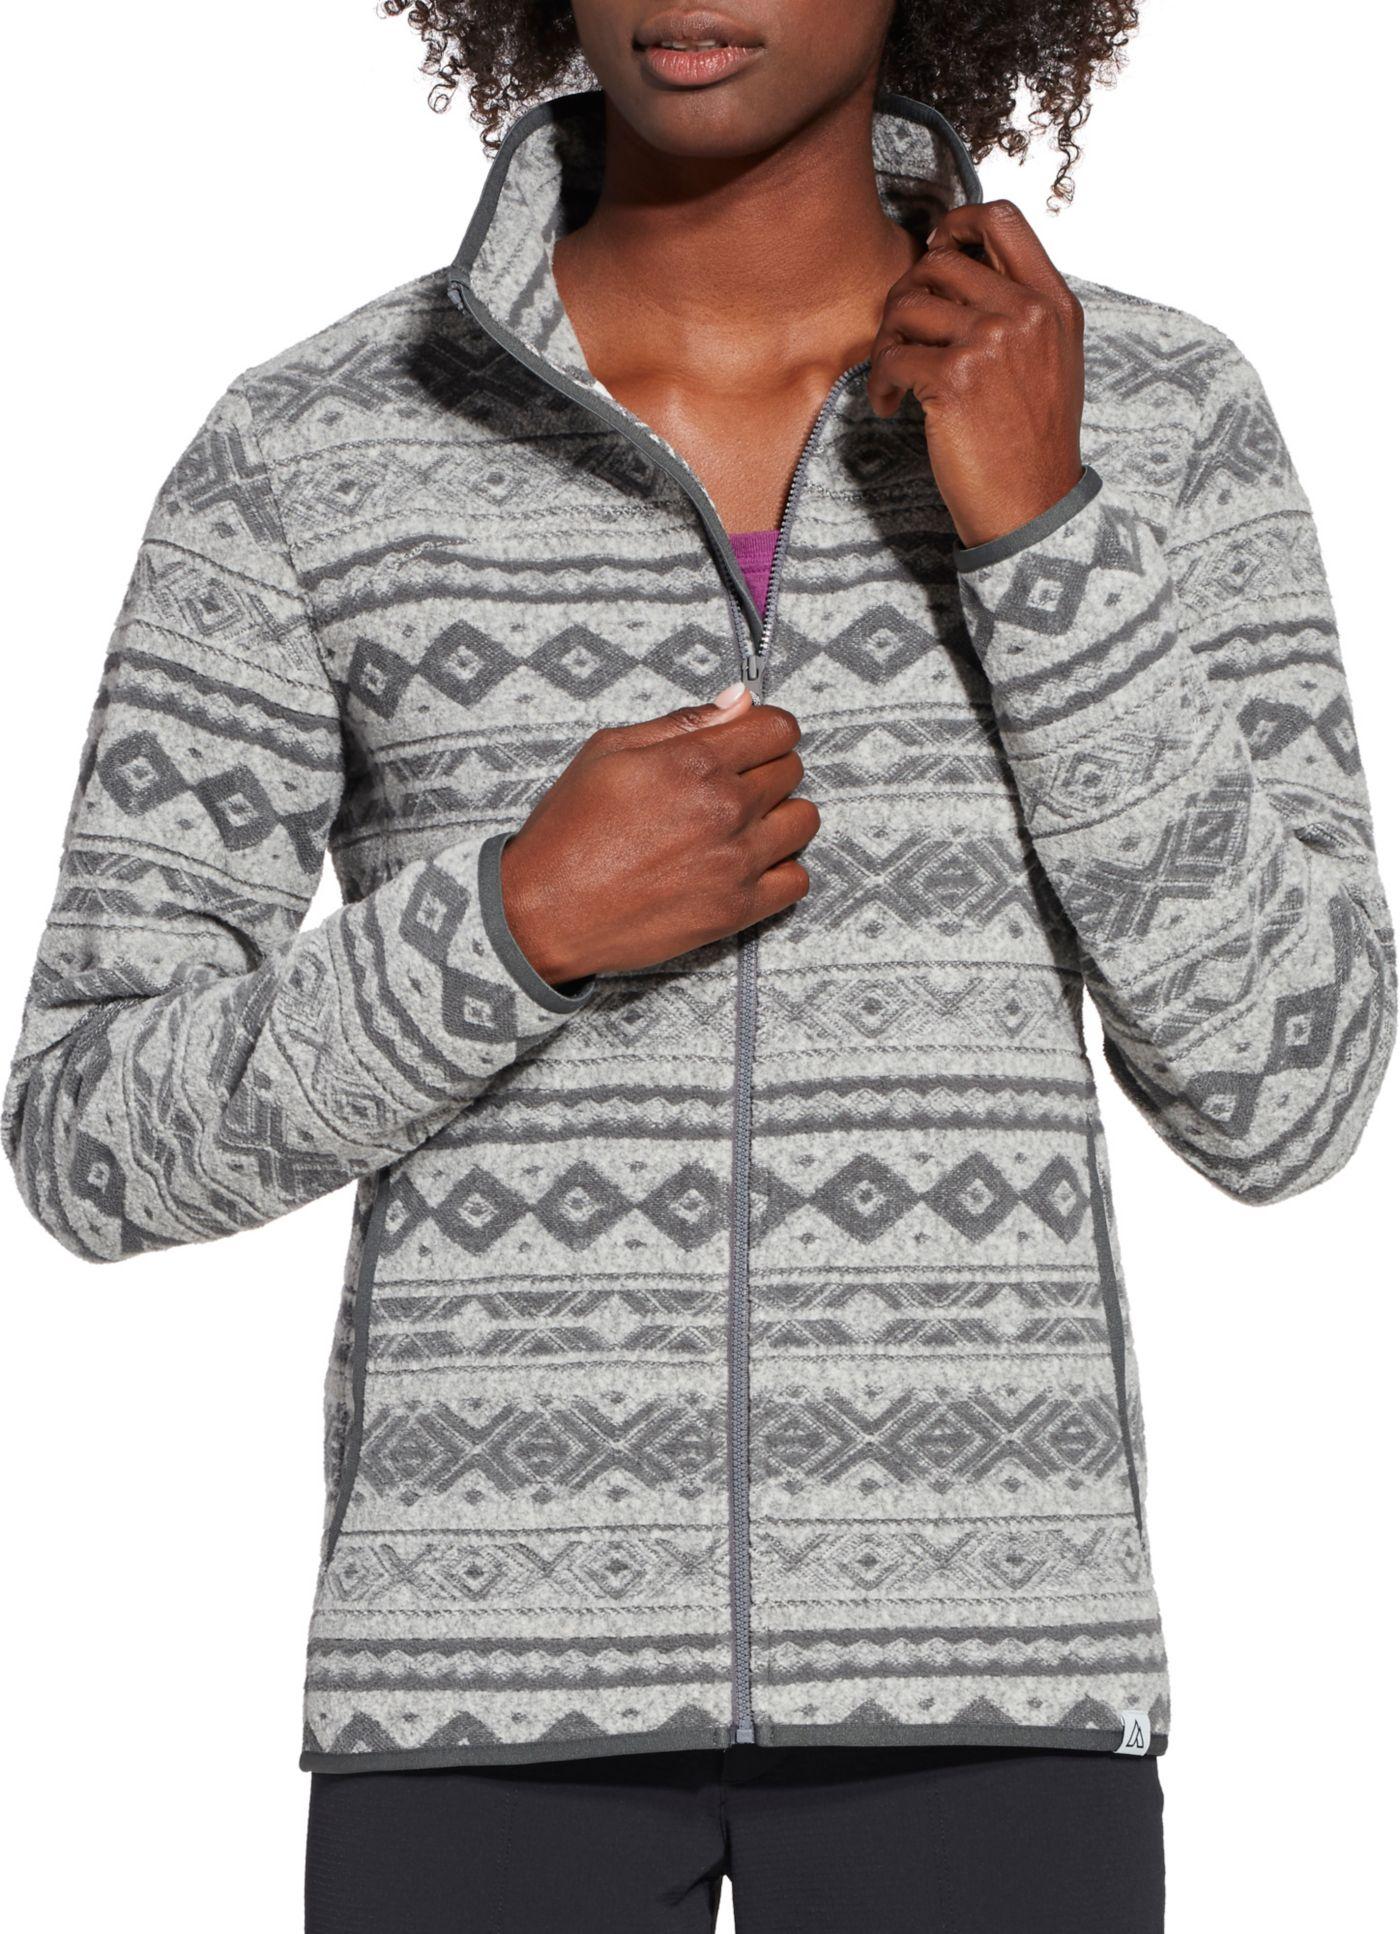 Alpine Design Women's Jacquard Fleece Jacket